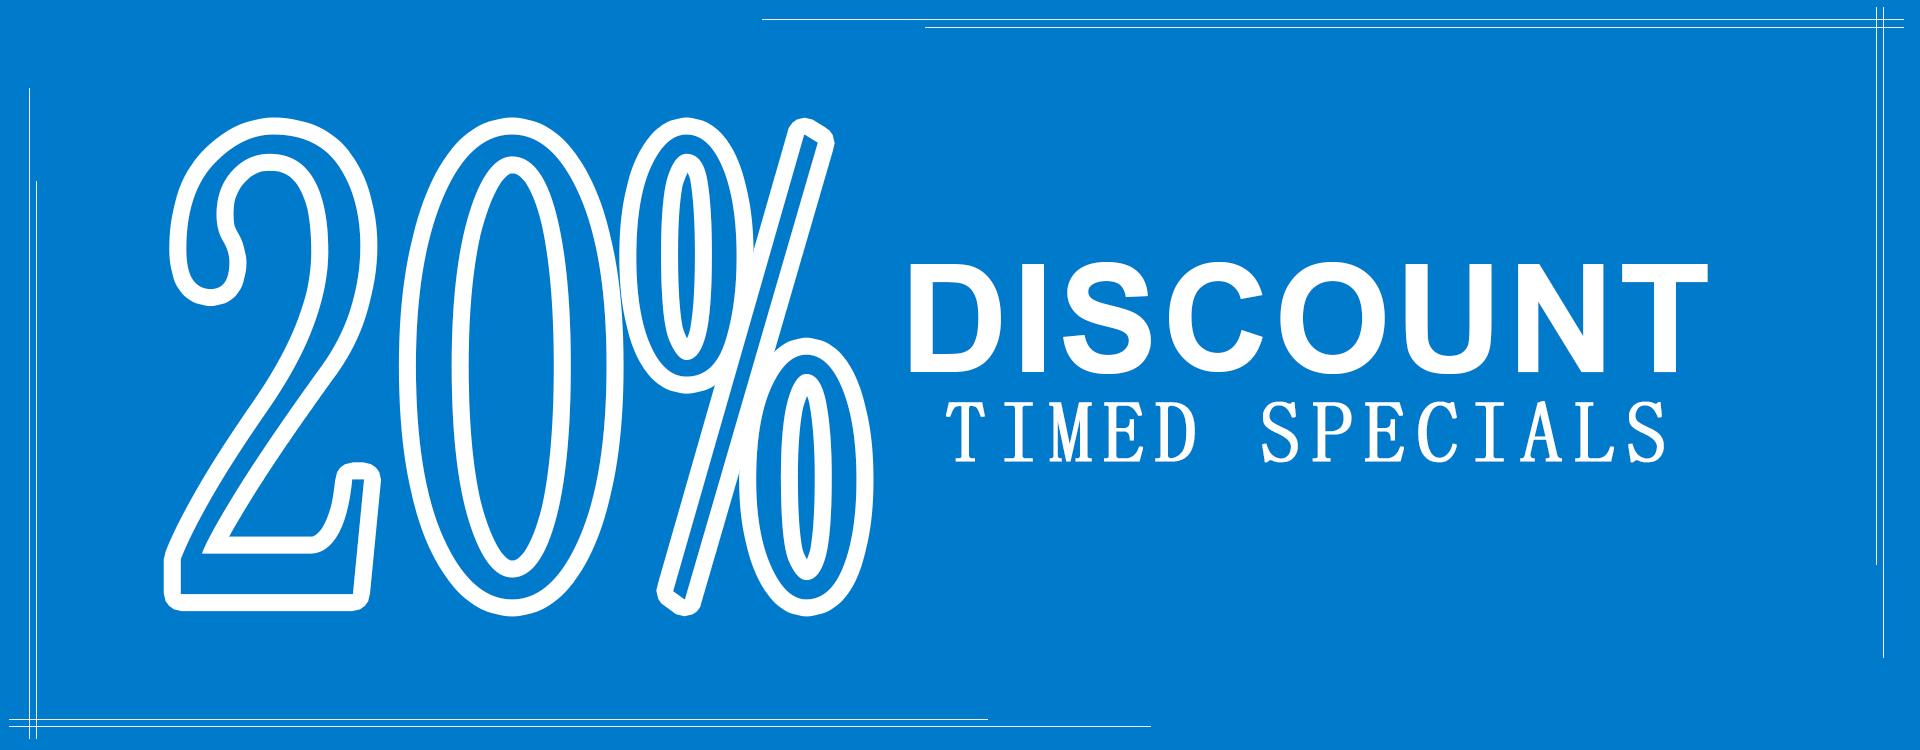 20-discount.jpg